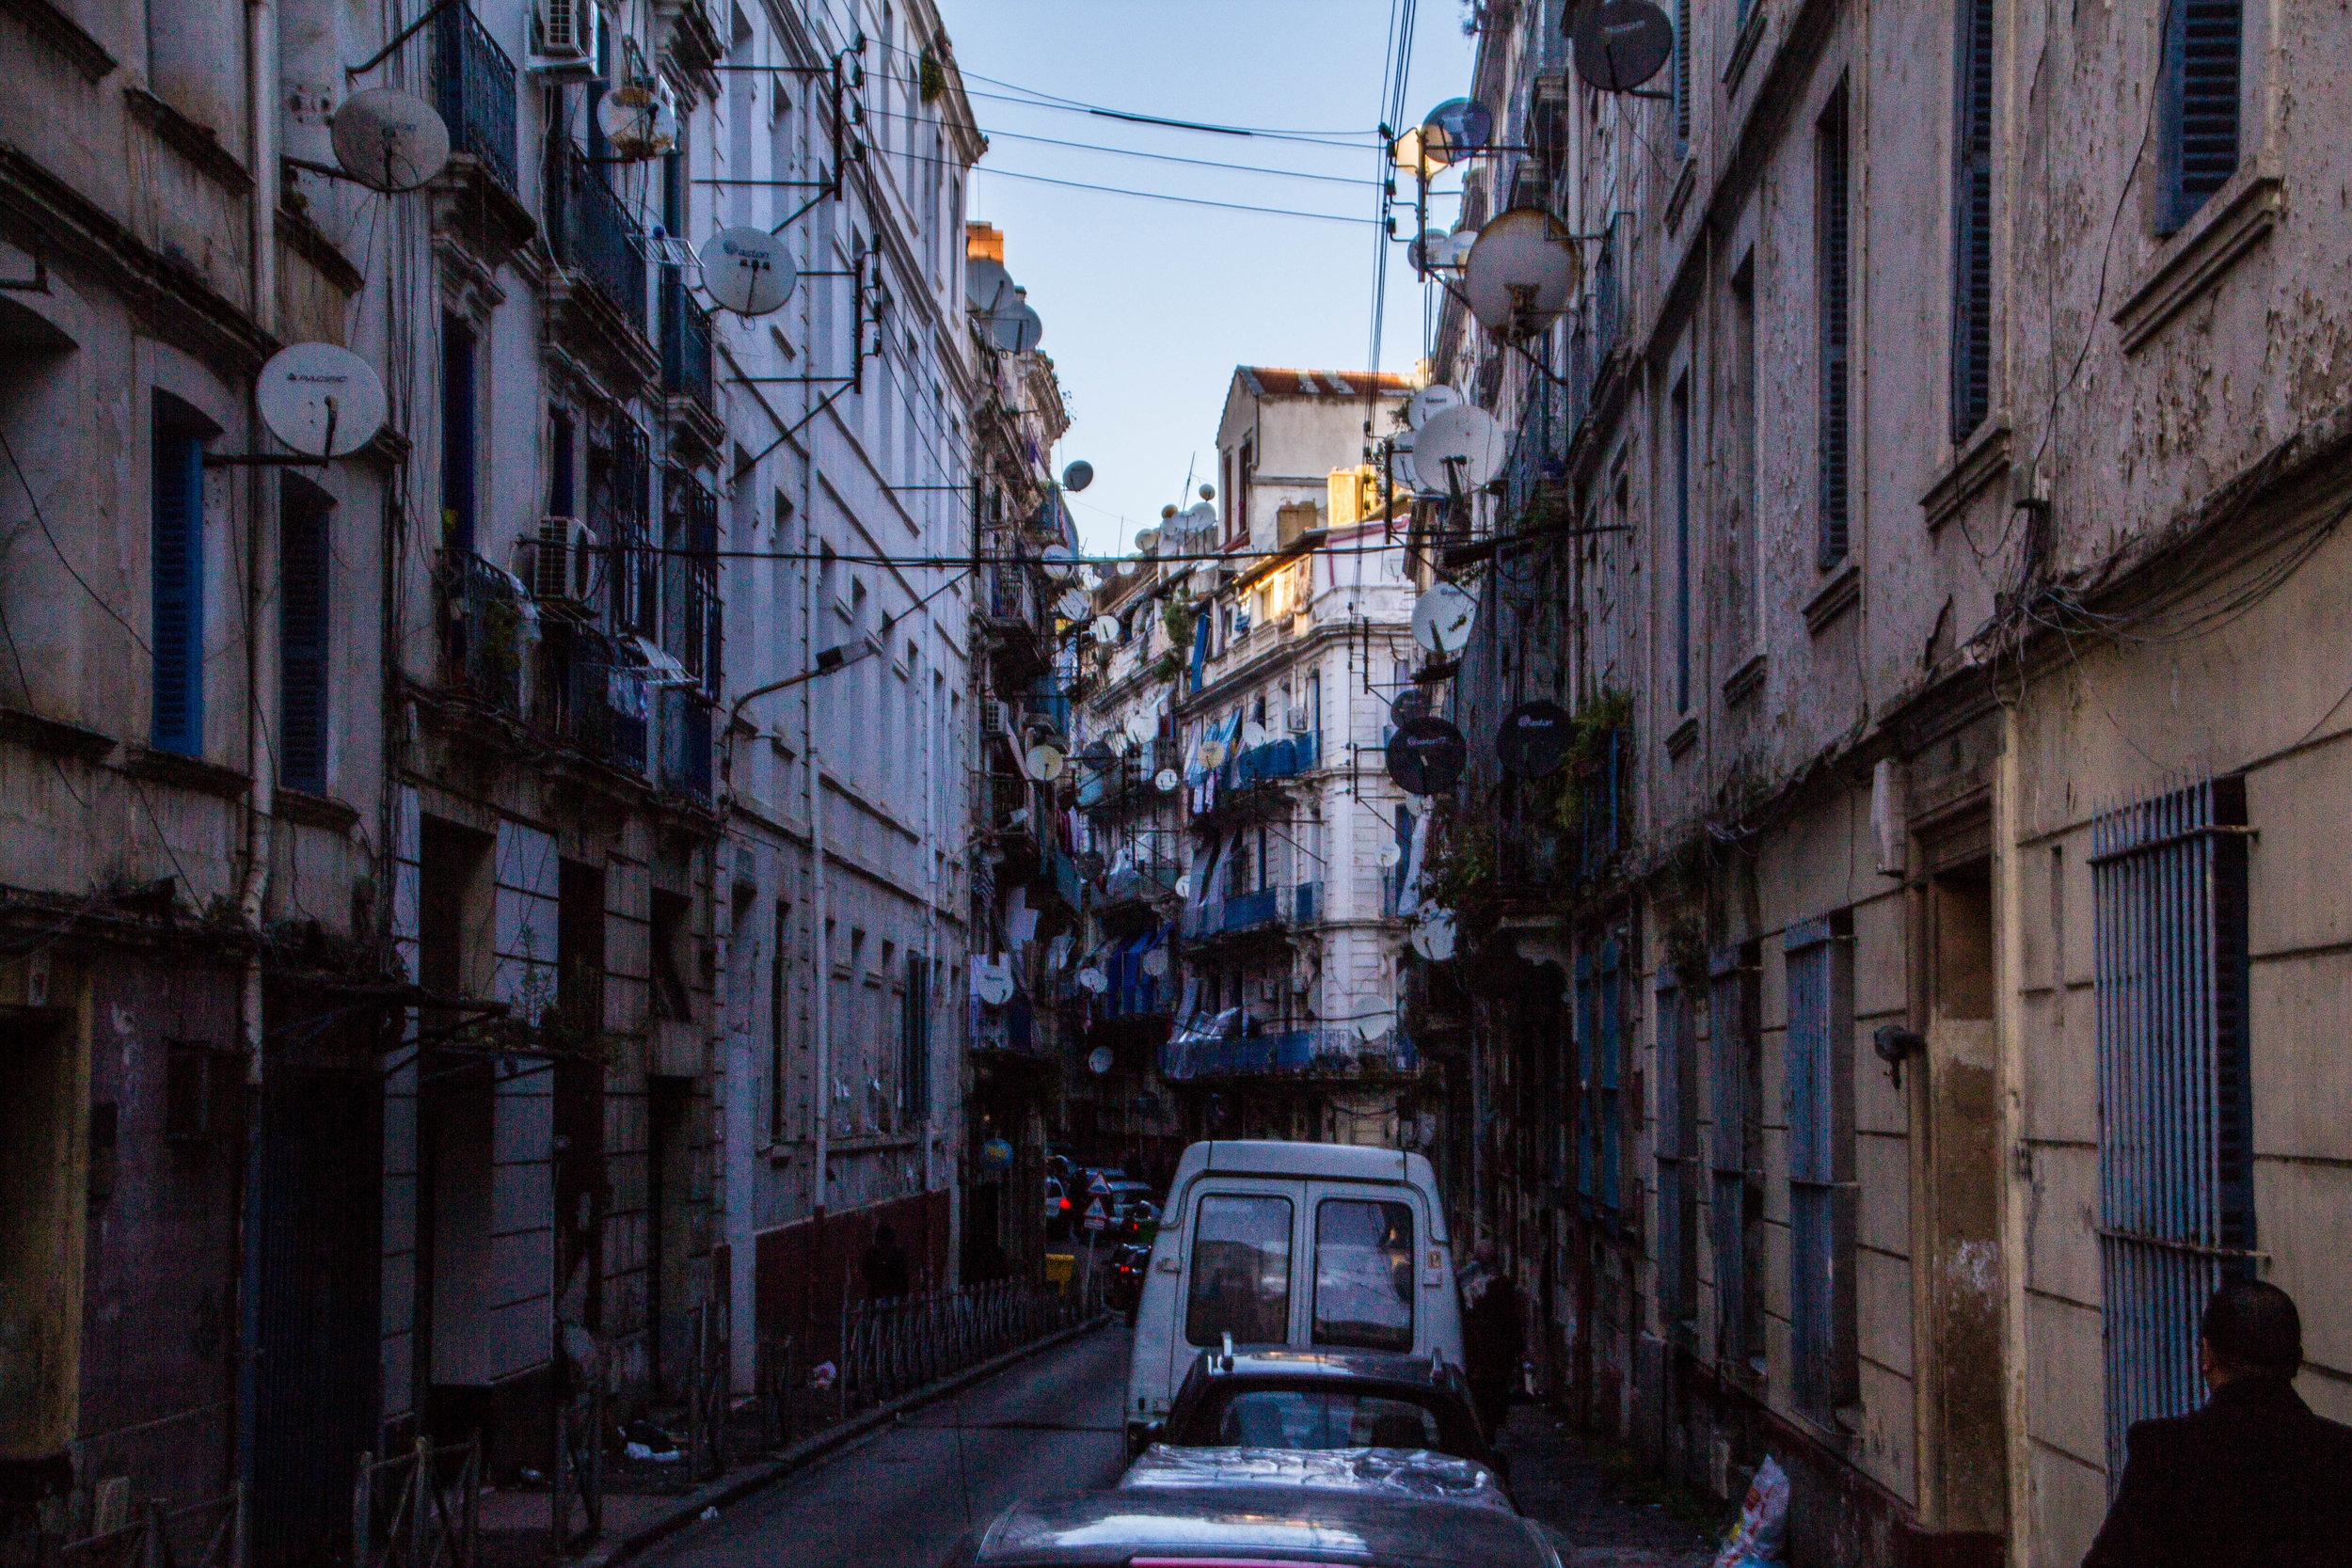 streets-algiers-algeria-18-2.jpg